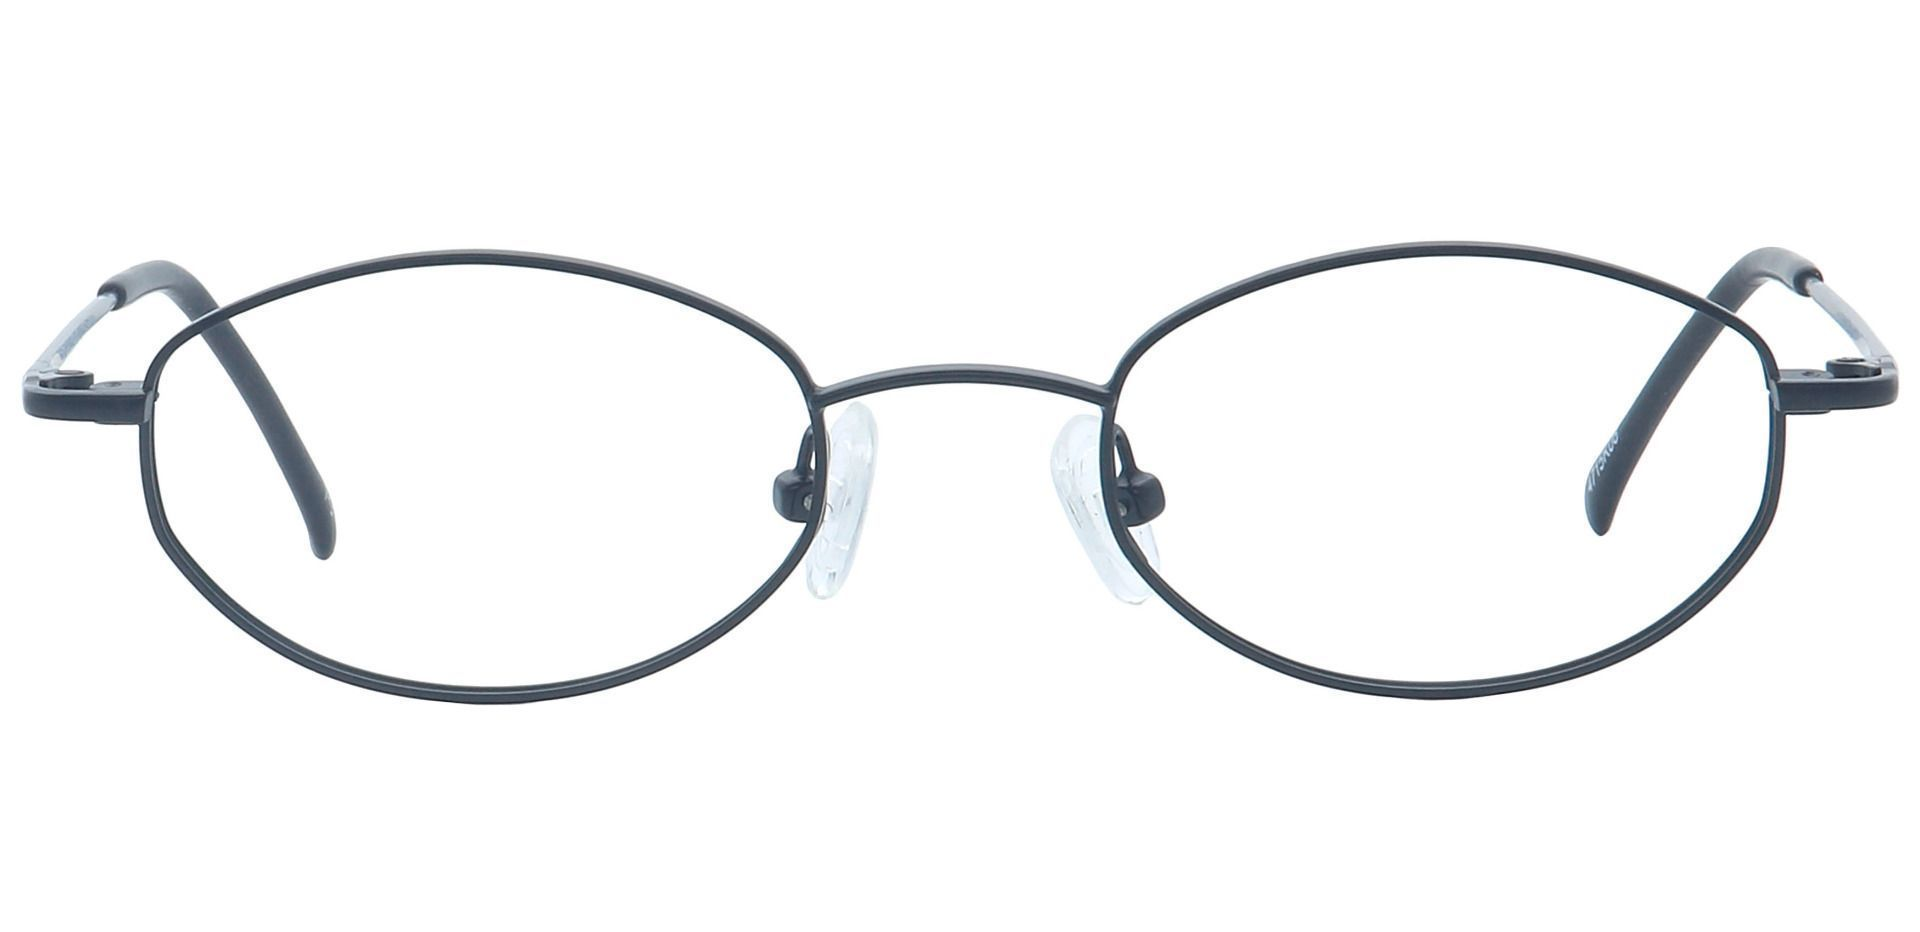 Bailey Oval Blue Light Blocking Glasses - Black